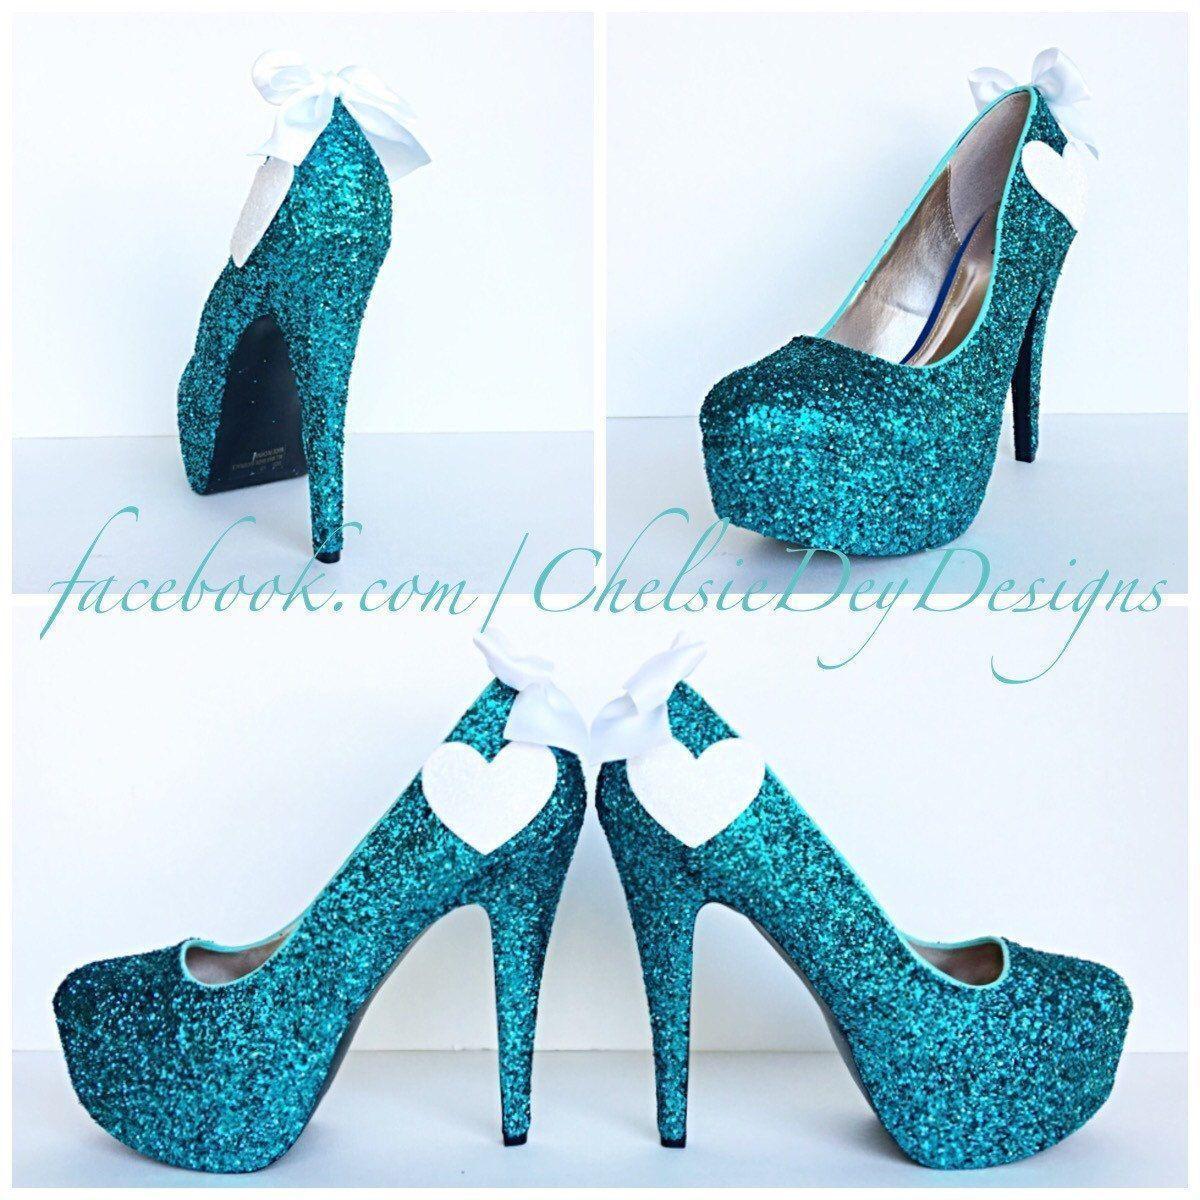 Teal glitter high heels aqua turquoise blue pumps white hearts